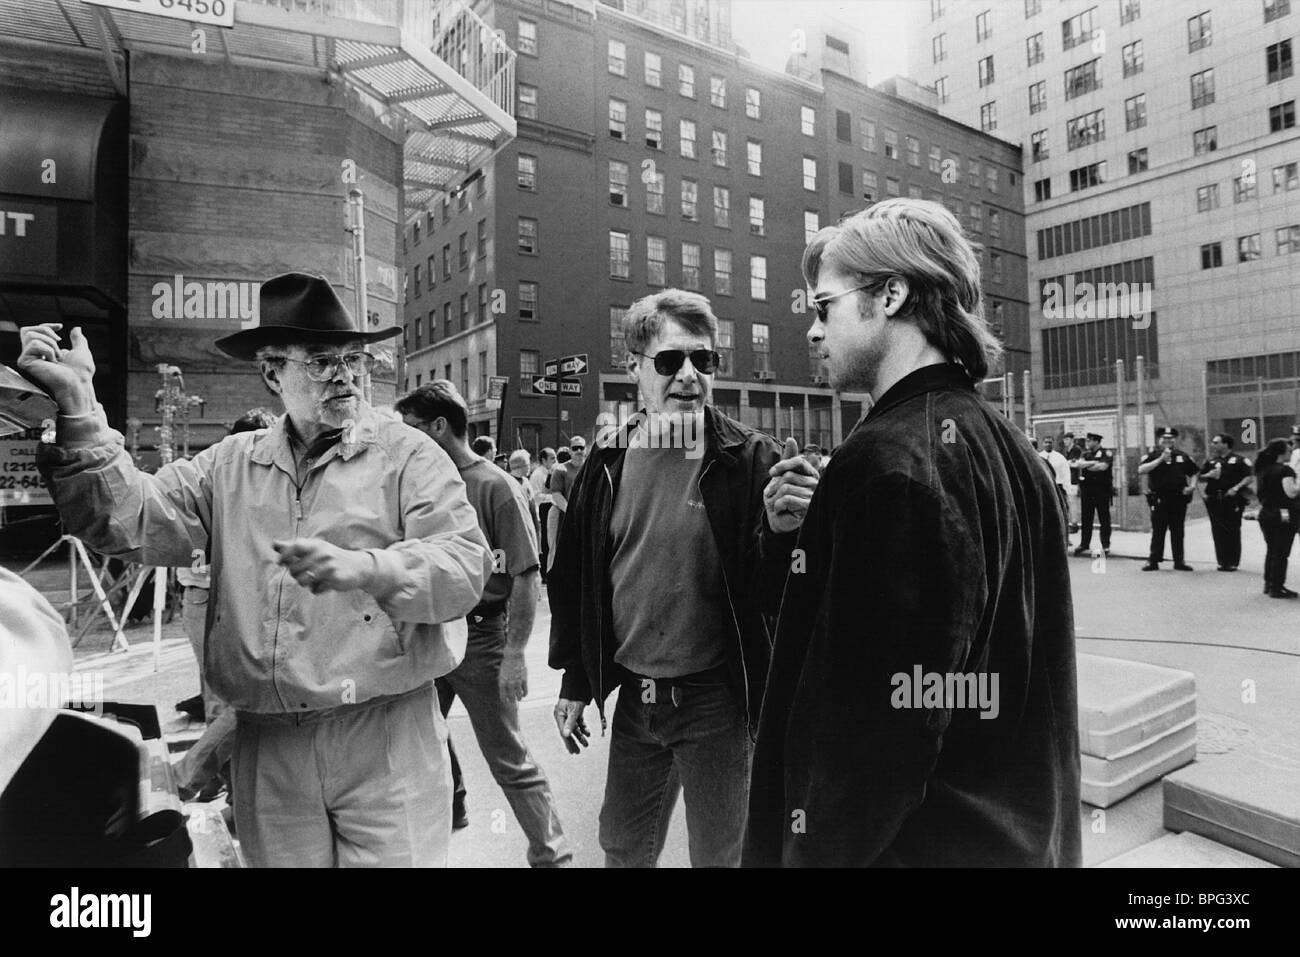 O Meara Ford >> ALAN J. PAKULA HARRISON FORD & BRAD PITT THE DEVIL'S OWN (1997 Stock Photo, Royalty Free Image ...